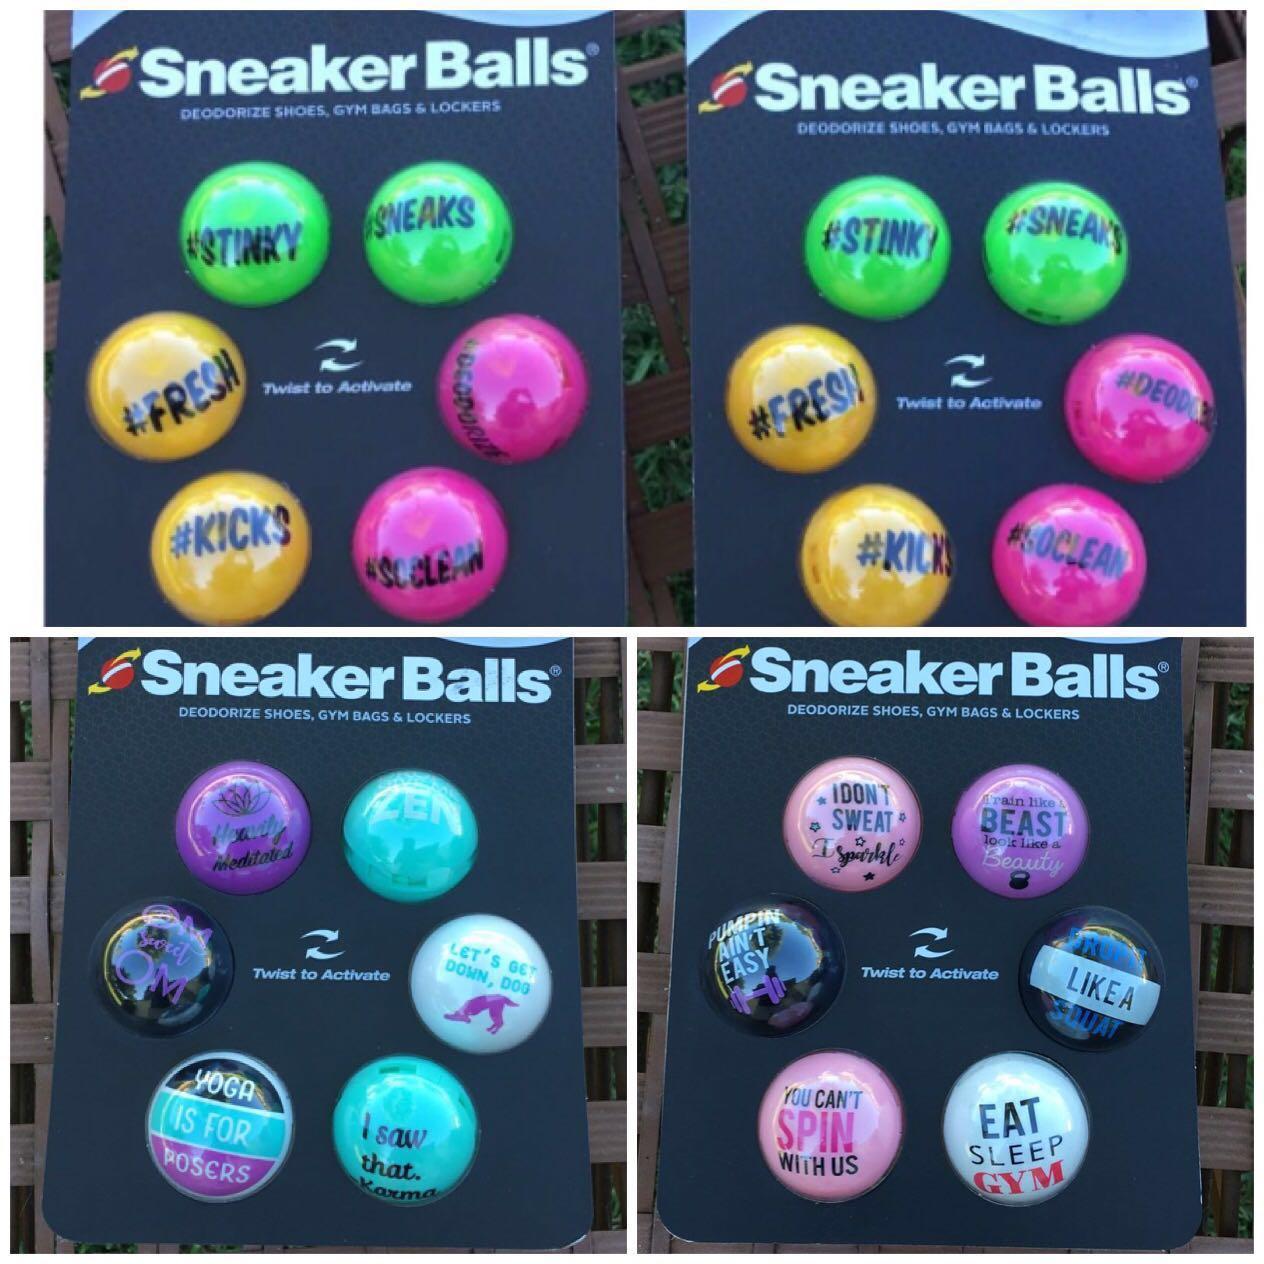 3e3f65825793 IN STOCK Sof Sole Sneaker Balls Shoe Gym Bag and Locker deodorizer ...